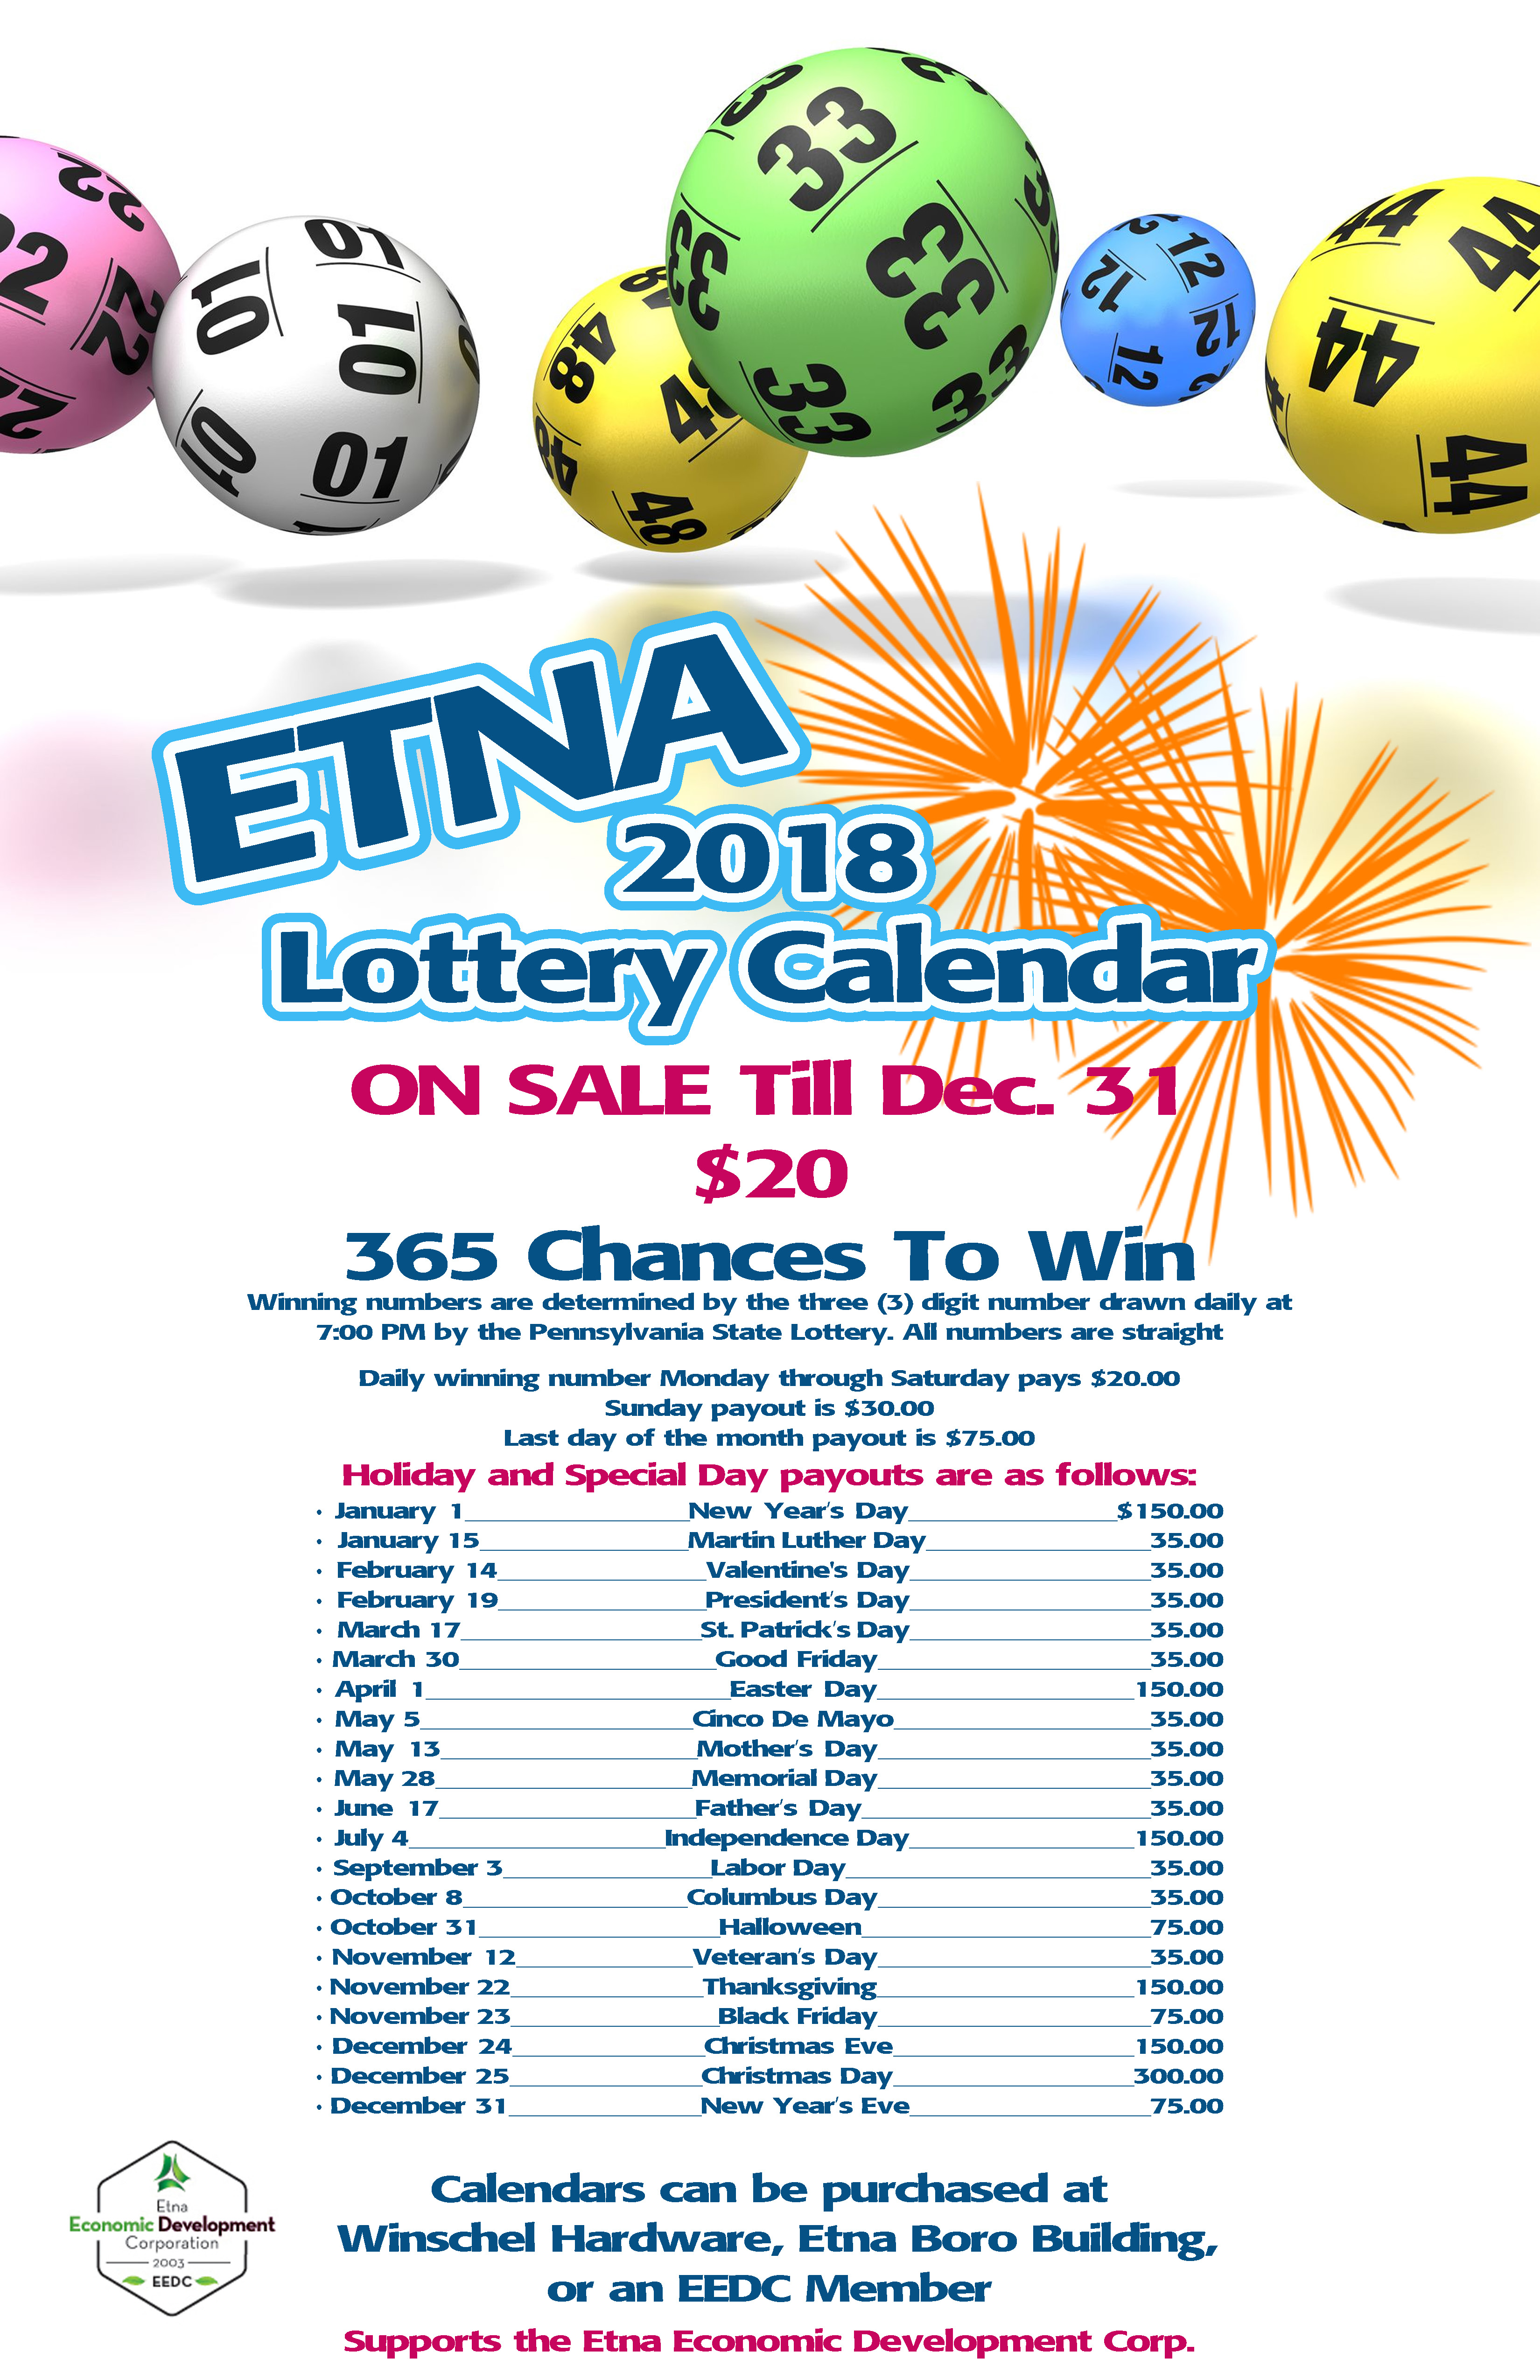 EEDC 2018 Lottery Calendar Sale